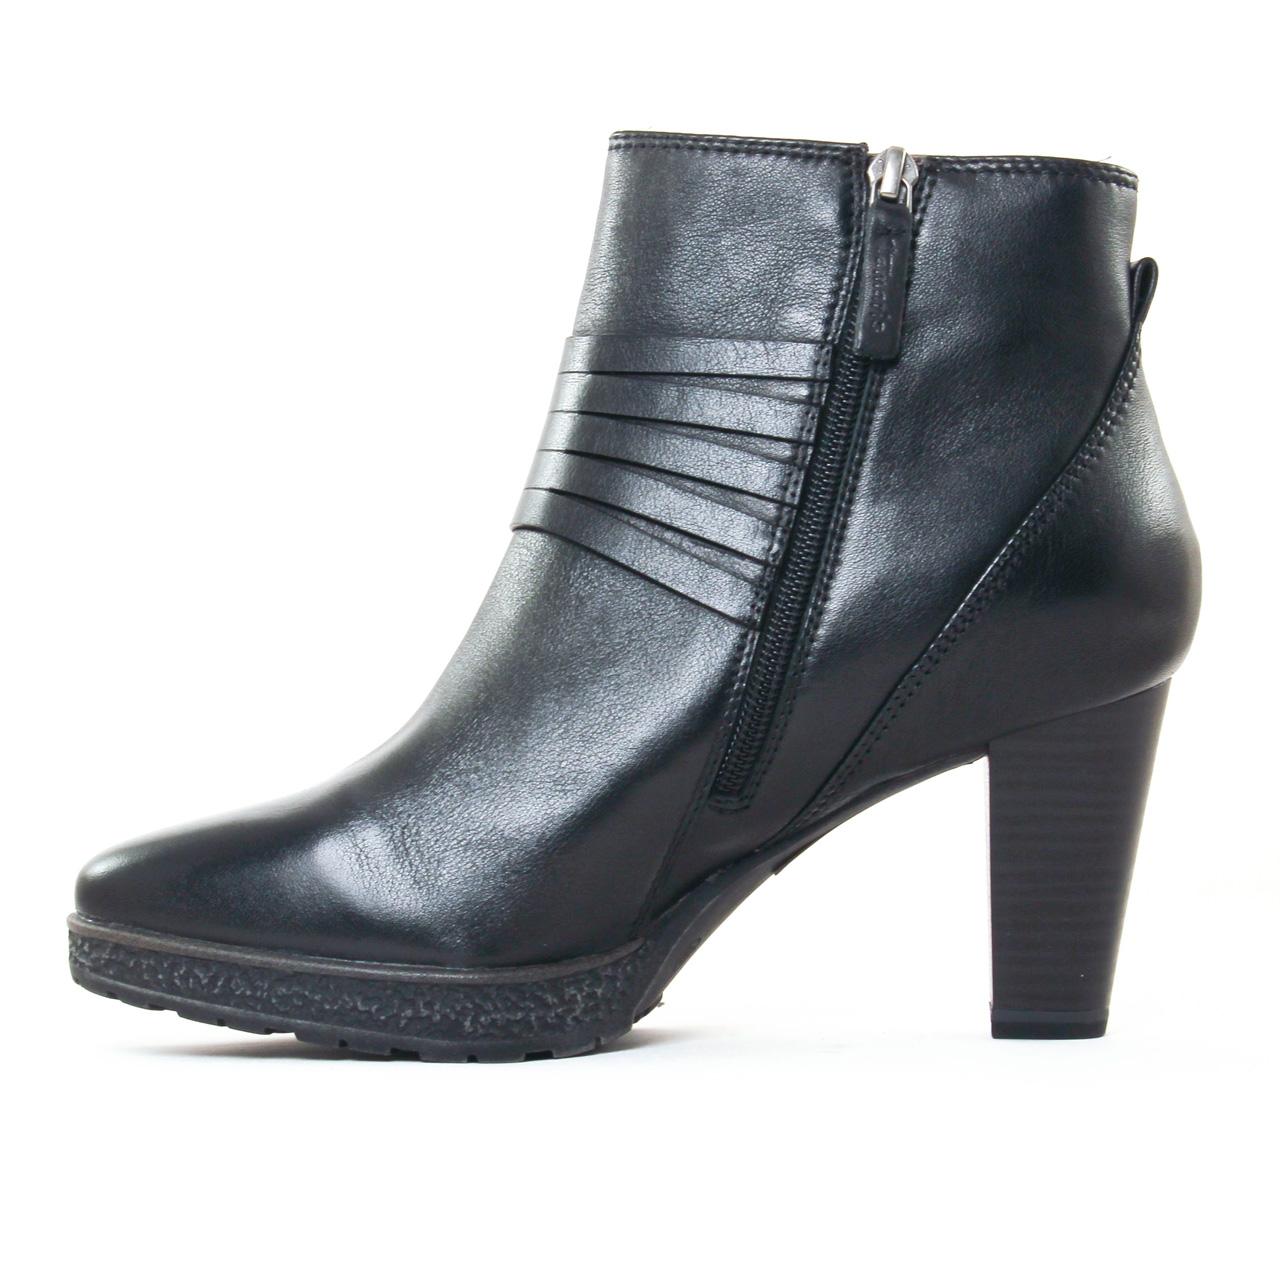 25320, Bottes Femme, Noir (Black), 38 EUTamaris